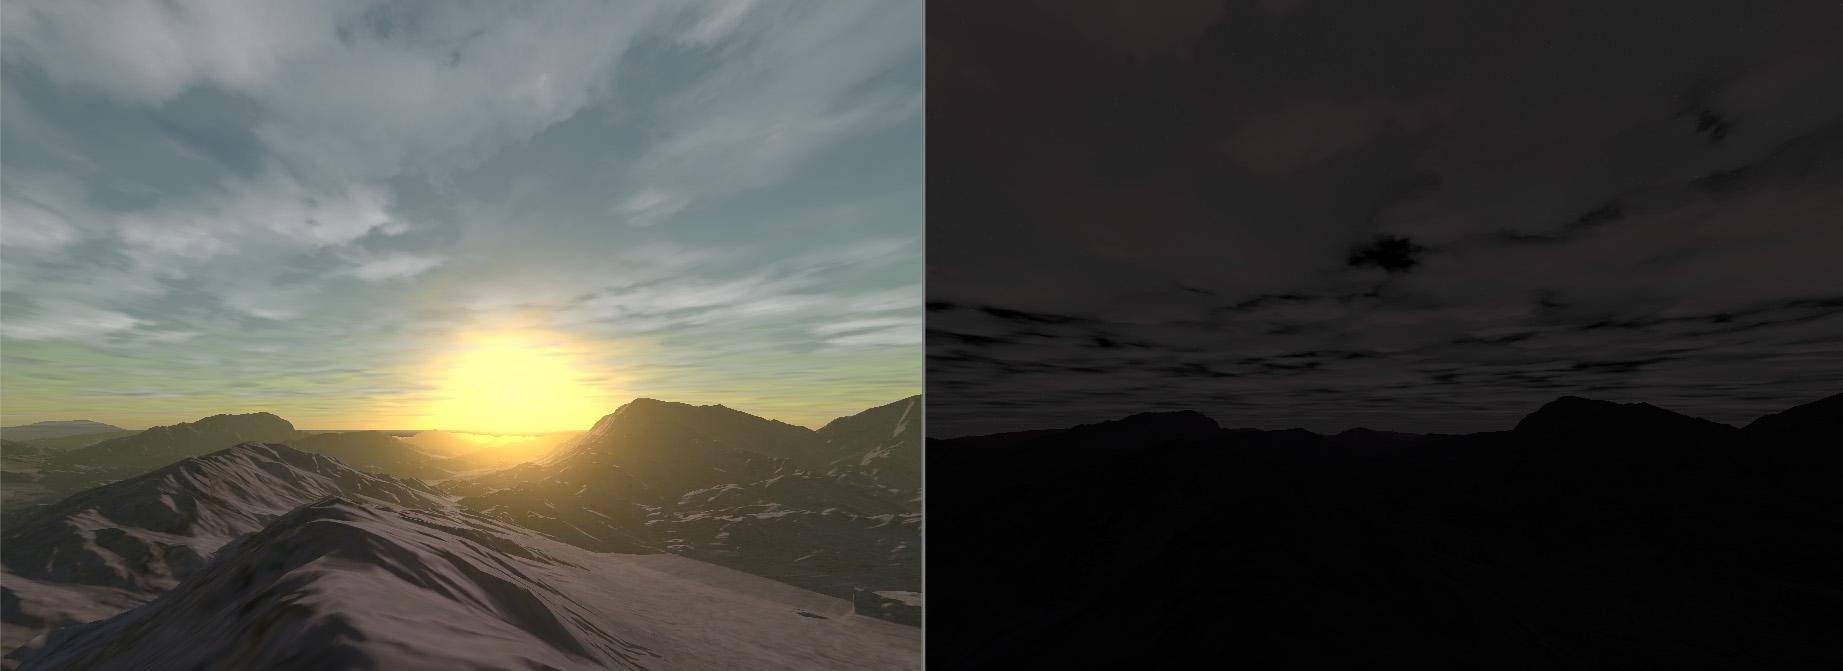 atmospherics.jpg